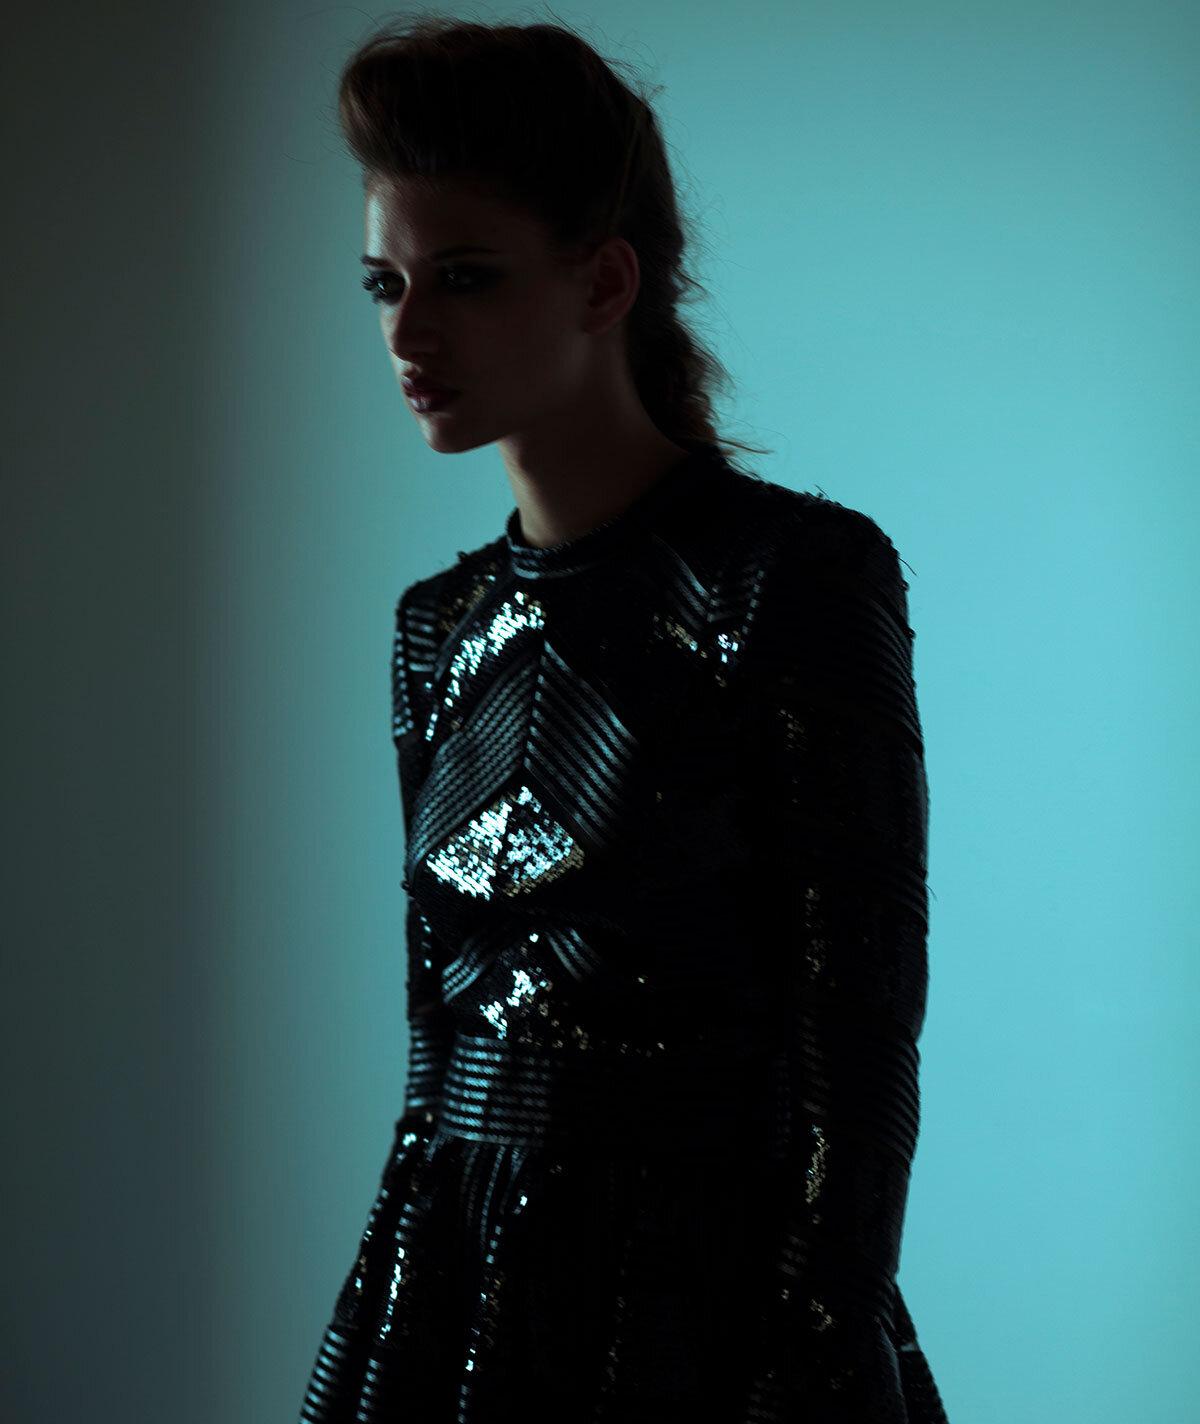 wetrust-gallery_fashion1.jpg